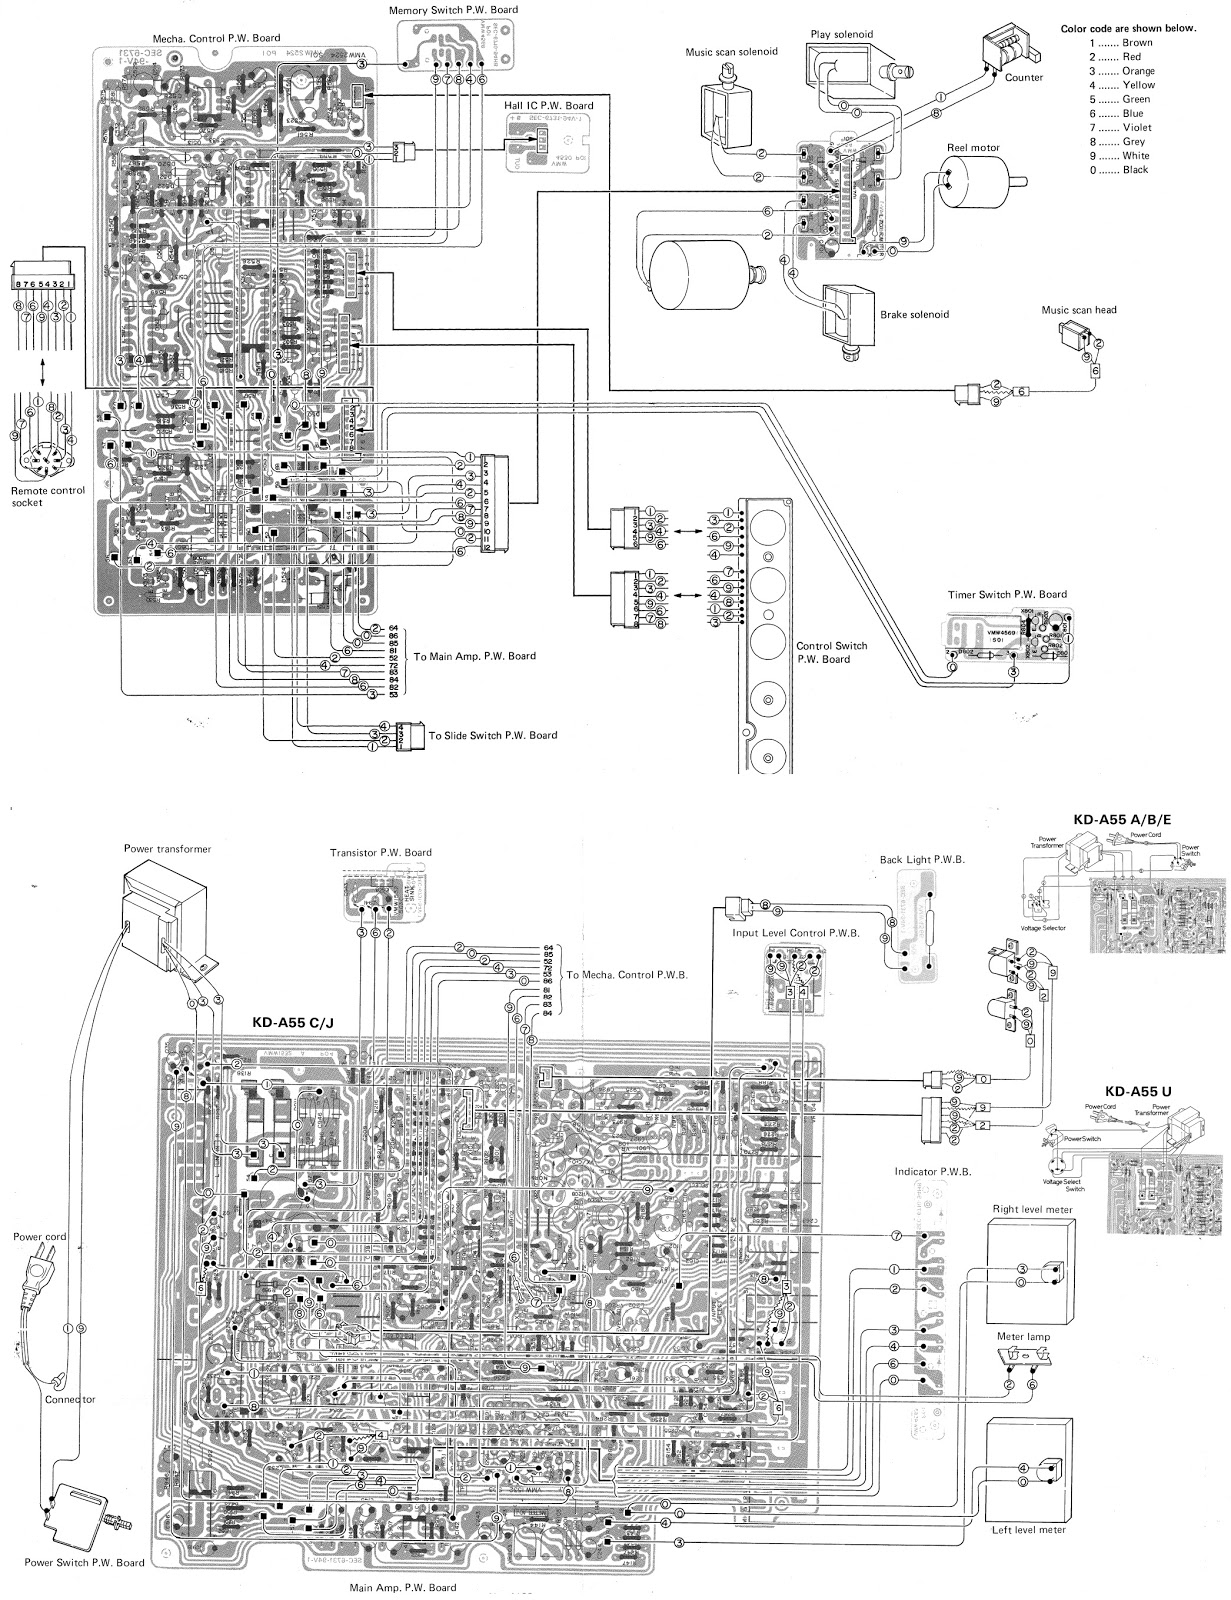 small resolution of jvc deck wiring diagram 19 sg dbd de u2022jvc kd a55 gradient cd6500 tape deck